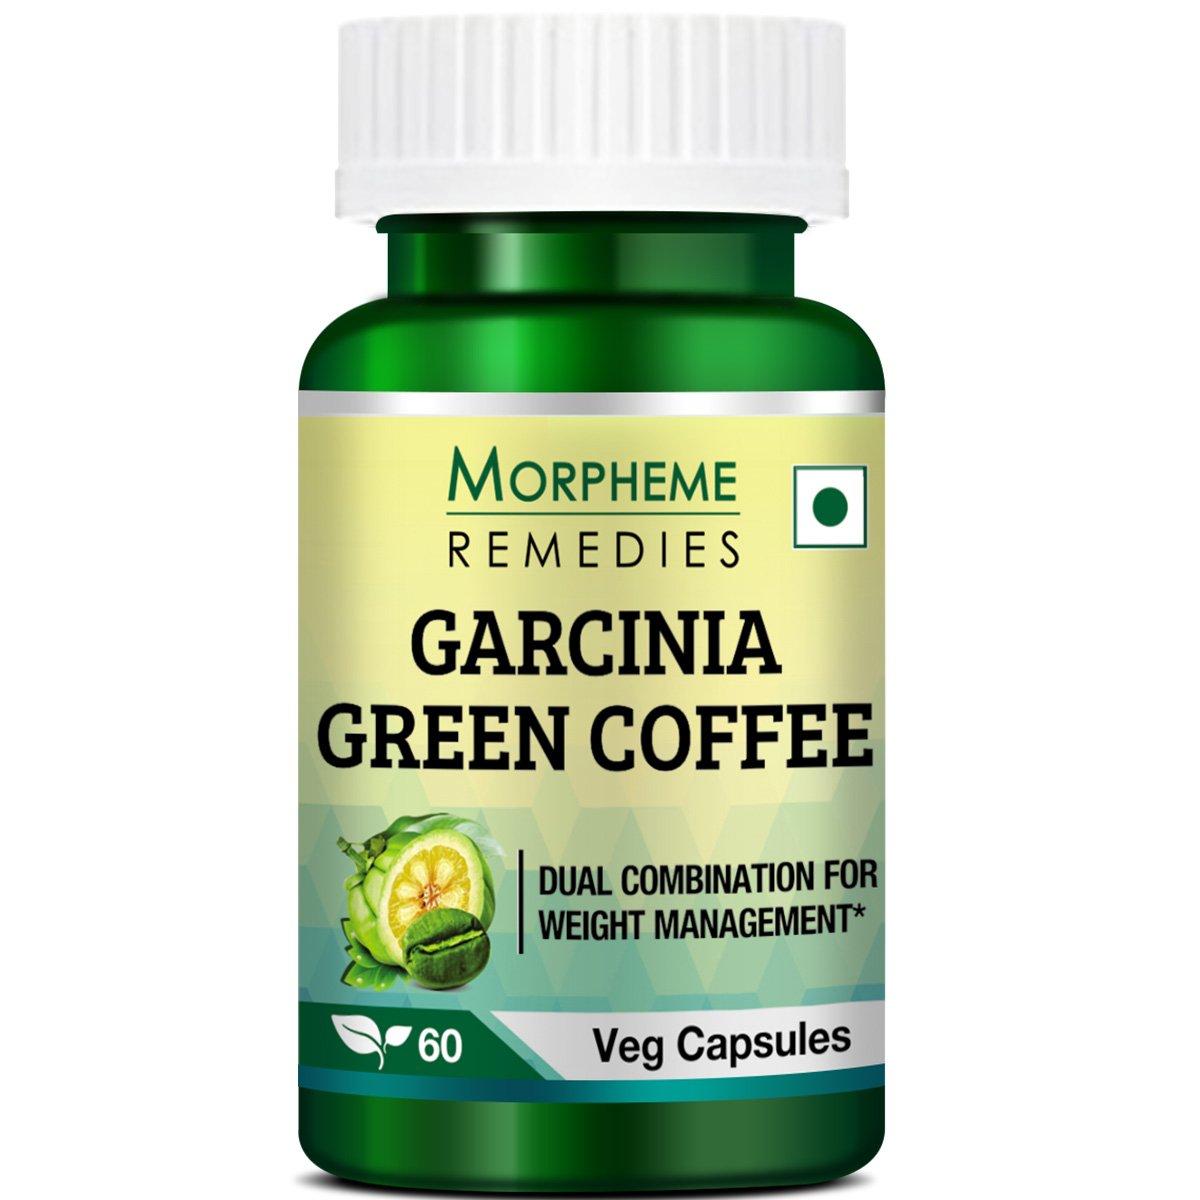 Morpheme Remedies Garcinia Green Coffee Bean Extract For Weight